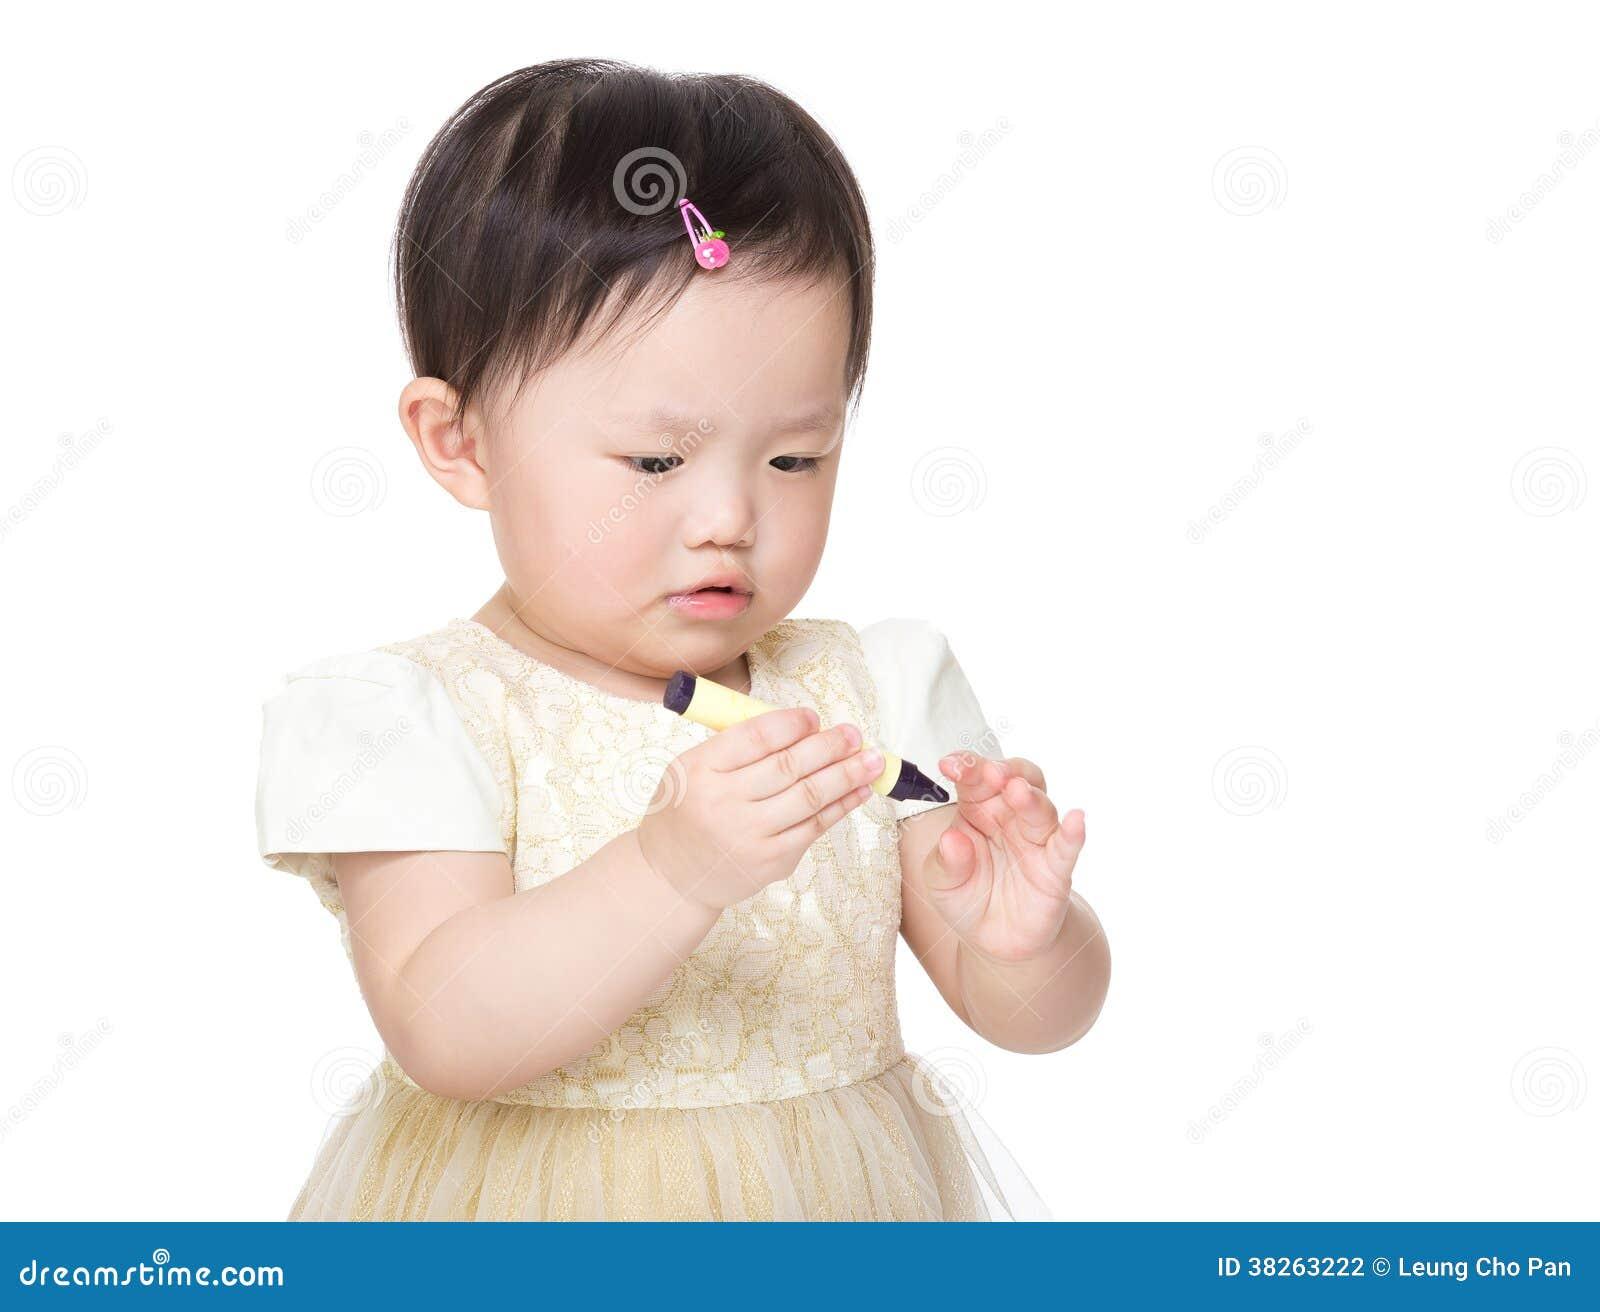 Asian baby girl holding crayon